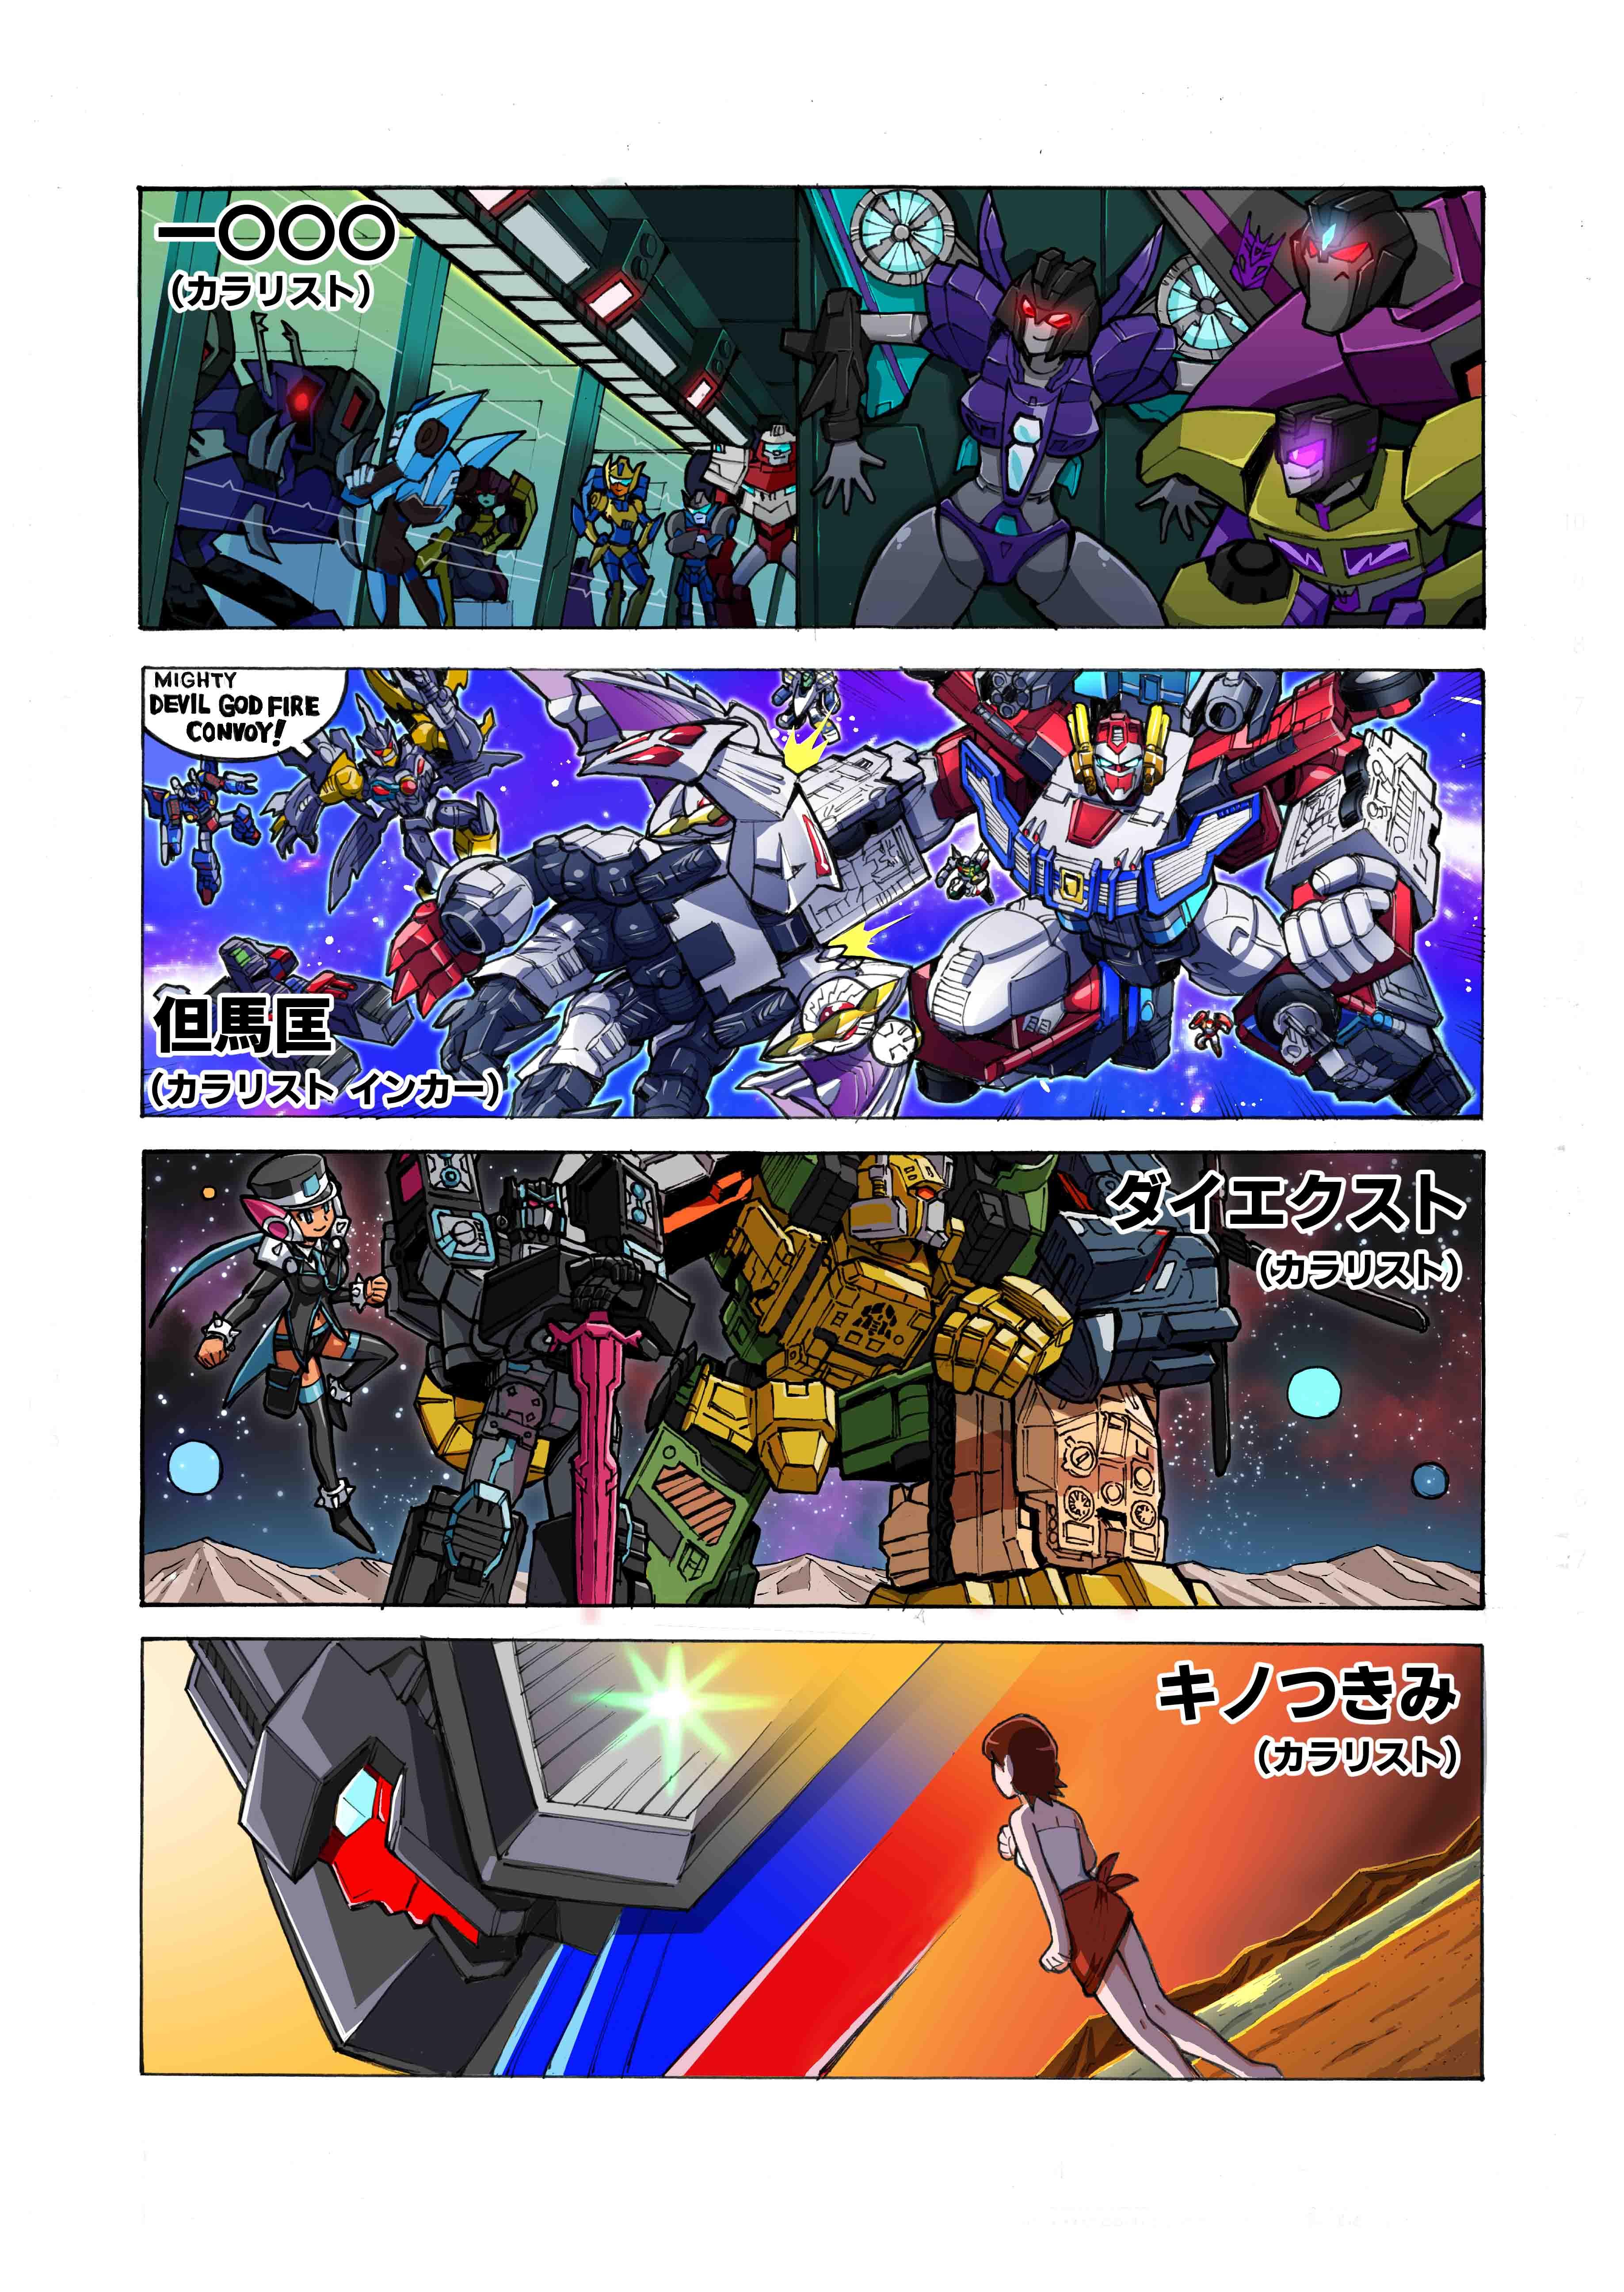 Legends-Web-Manga-Epilogue-14